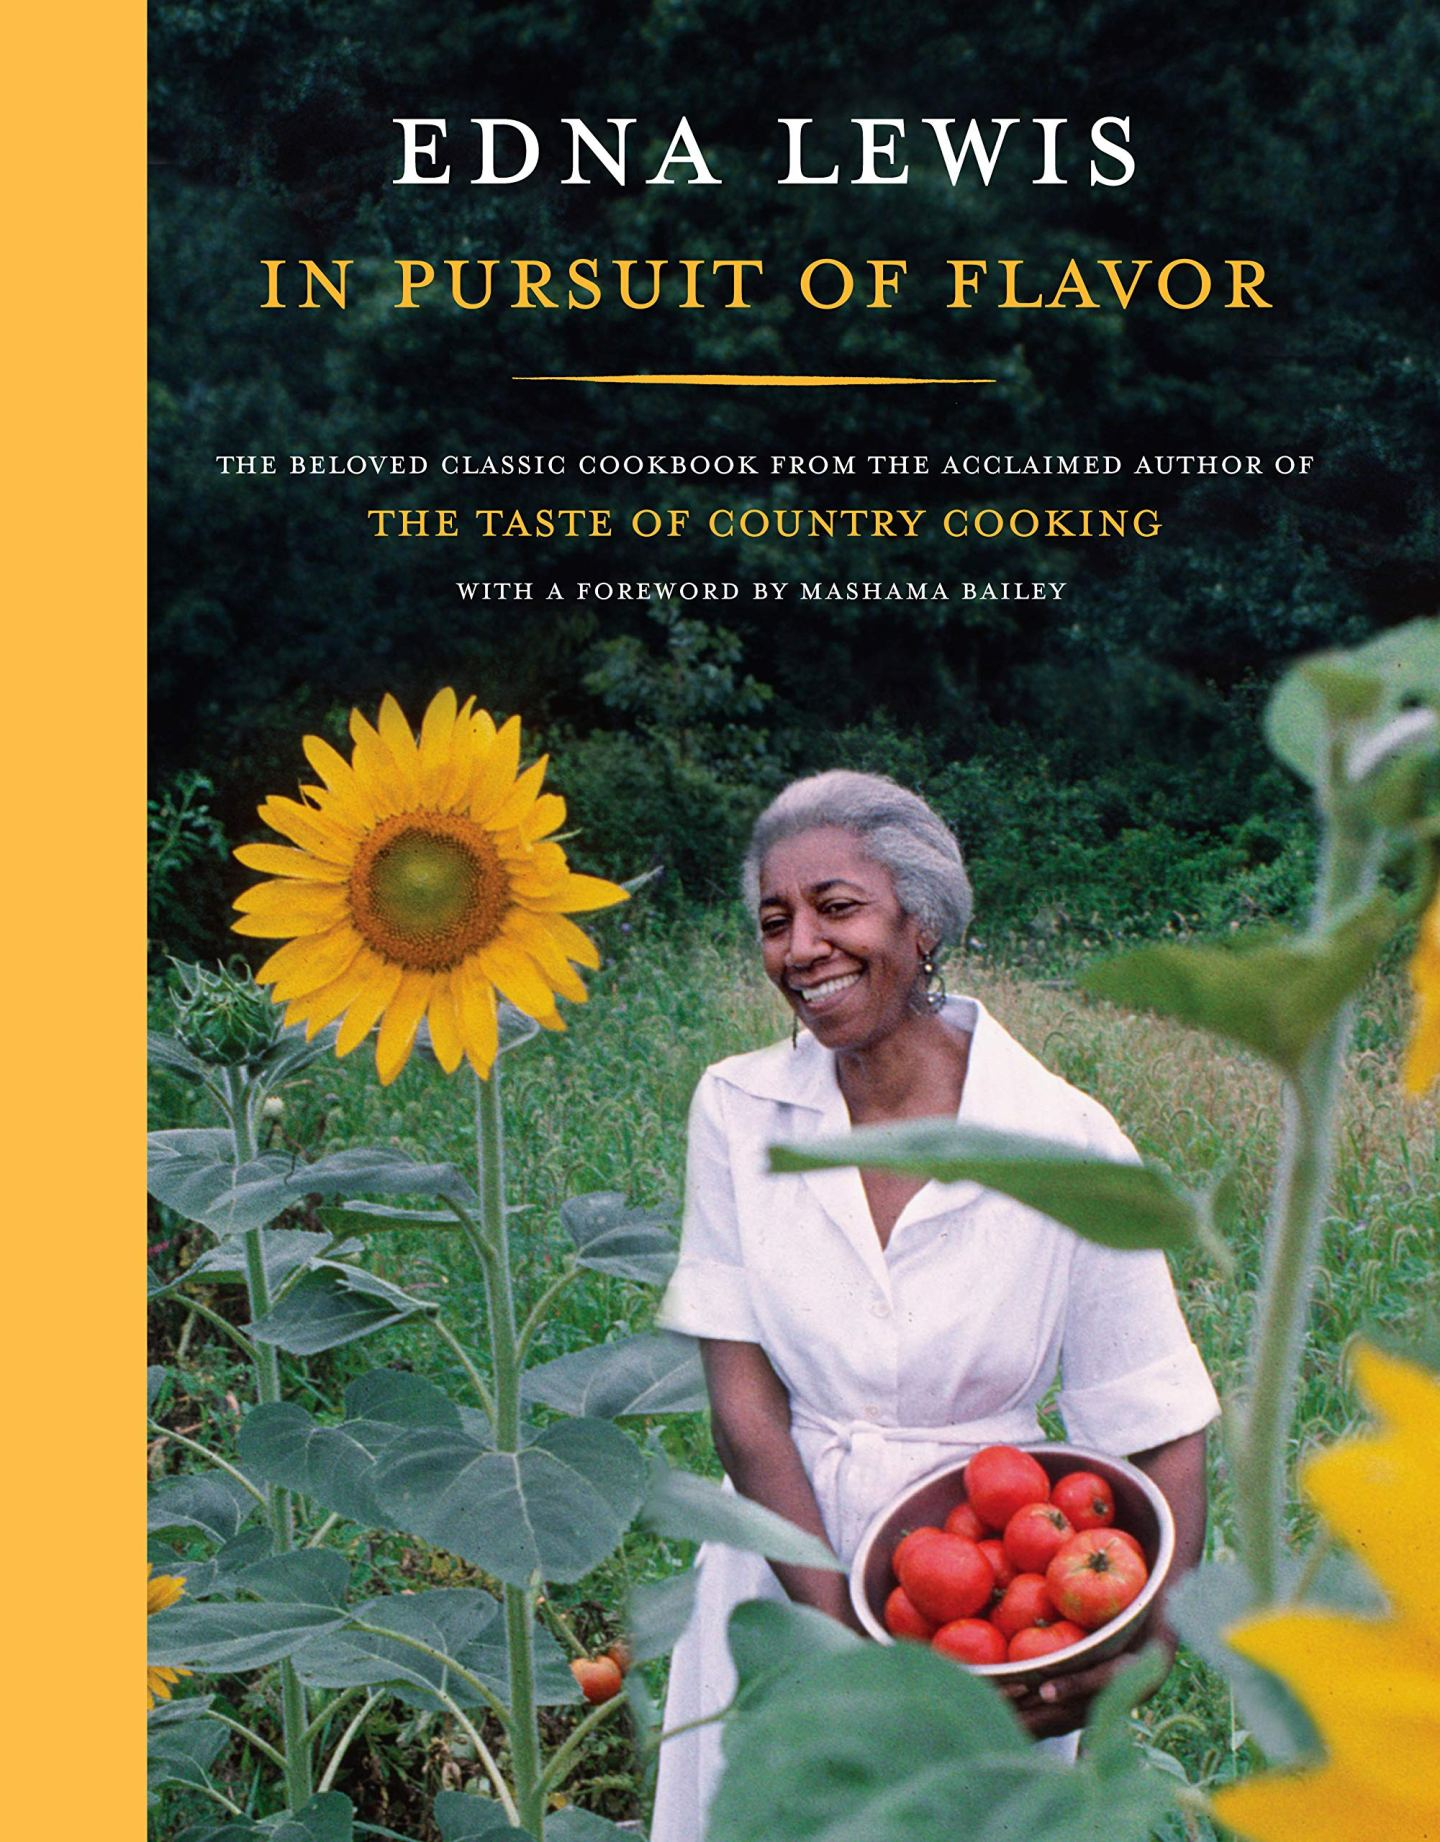 91IYD33gQcL-1440x1842 Soul Food Cookbooks We Love by 3 Black Southern Belle Legends of Food